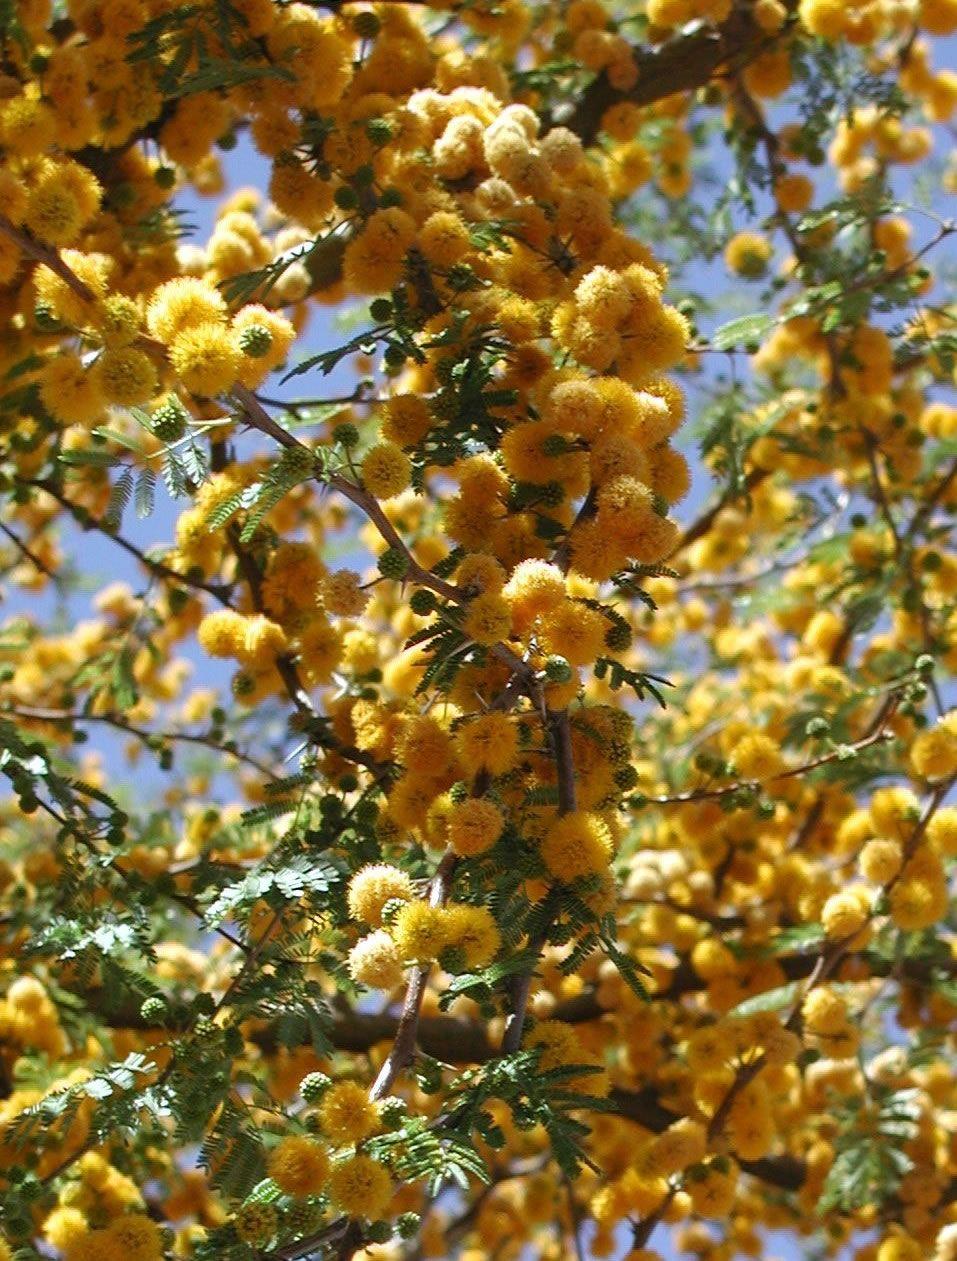 Acacia Farnesiana Sweet Acacia Flowers These Are Distilled For Their Essential Oils Bitki